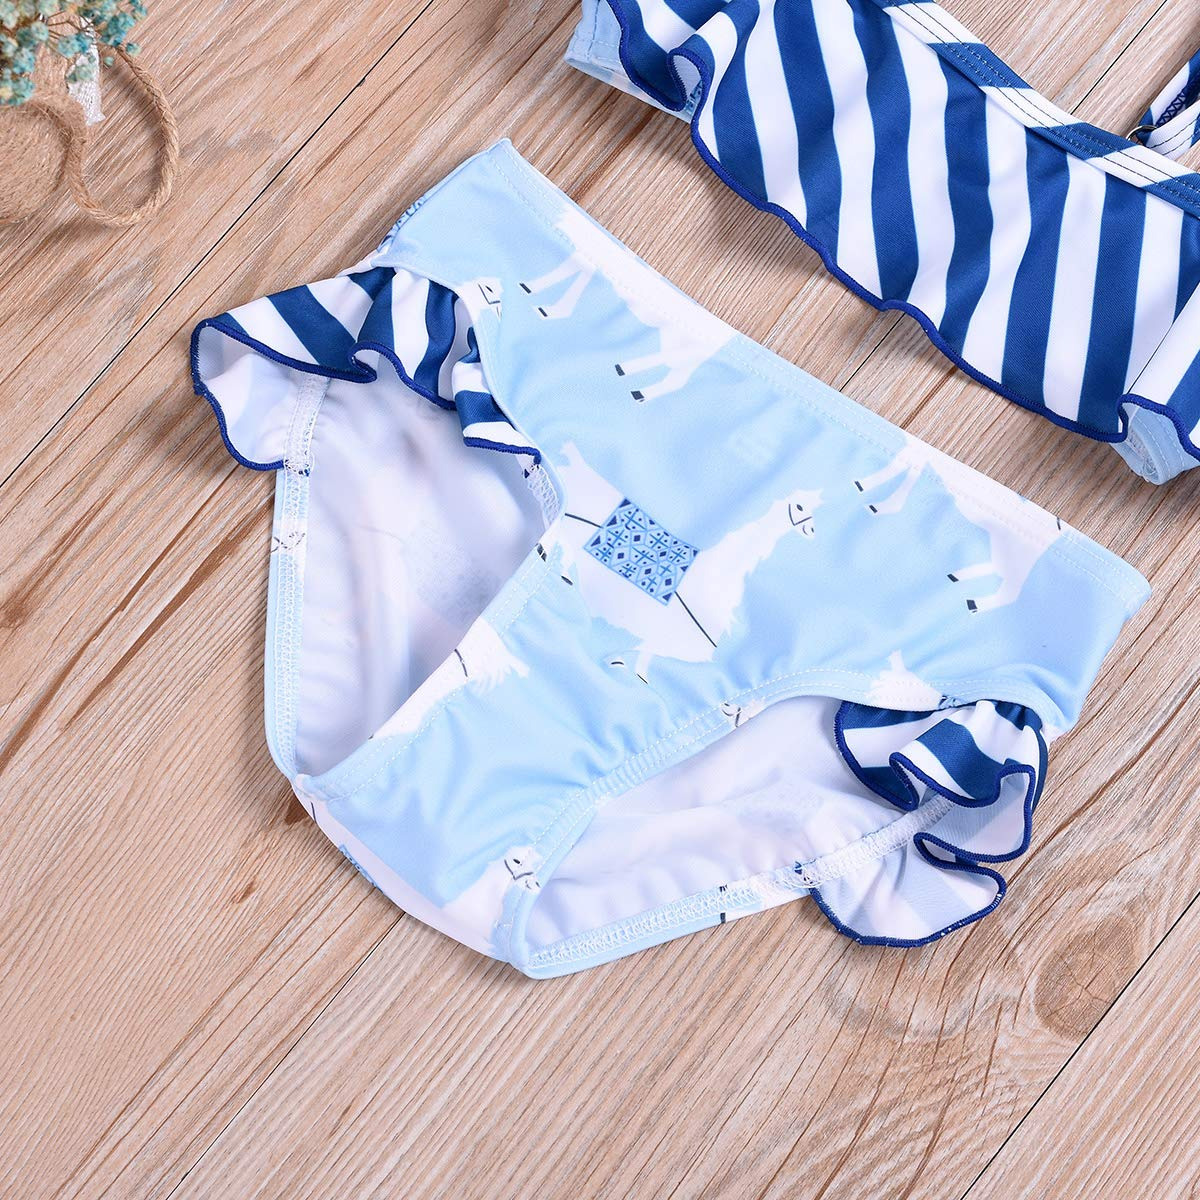 Camidy 1-7T Kids Toddler Baby Girl Swimsuit Ruffle Stripe Alpaca Swimwear Bathing Suit